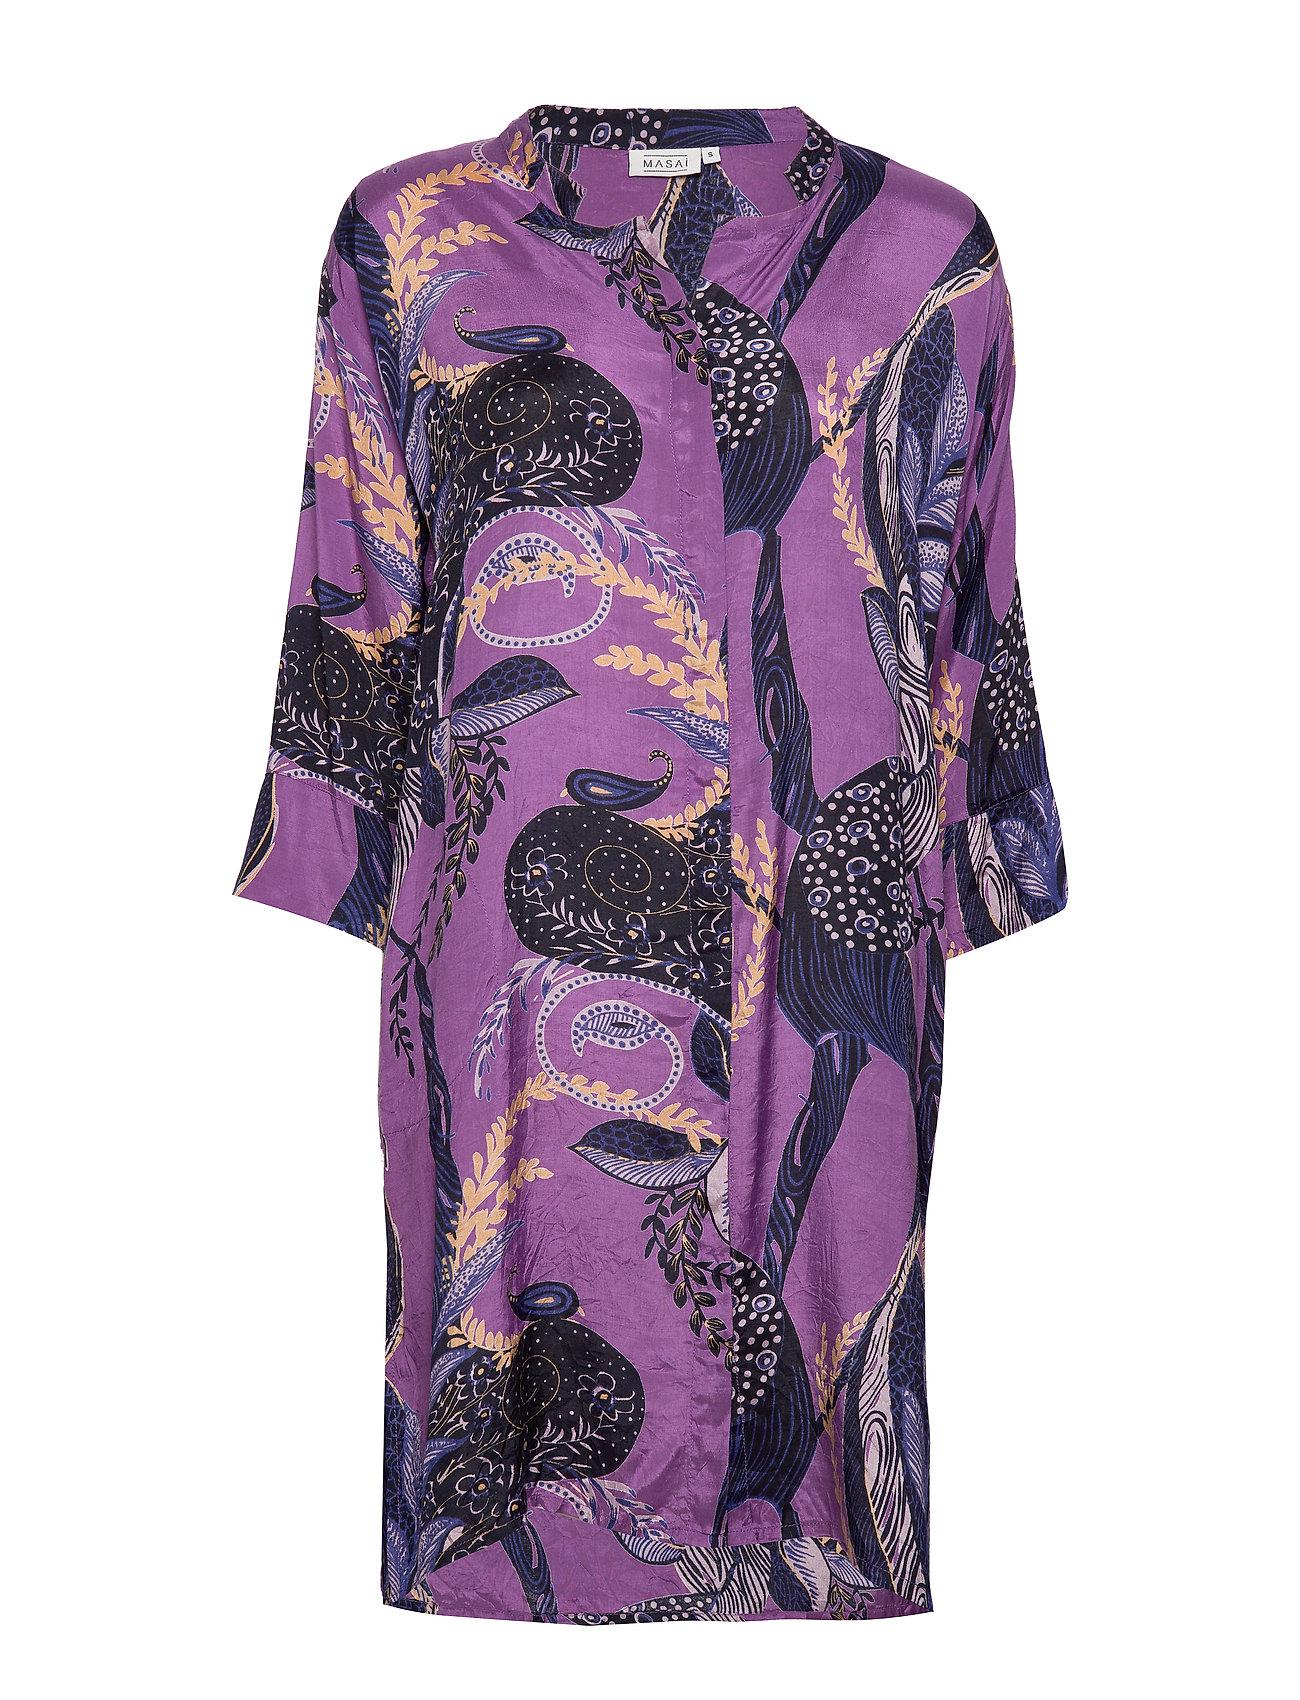 Masai Nimes shirt dress - VIOLET ORG